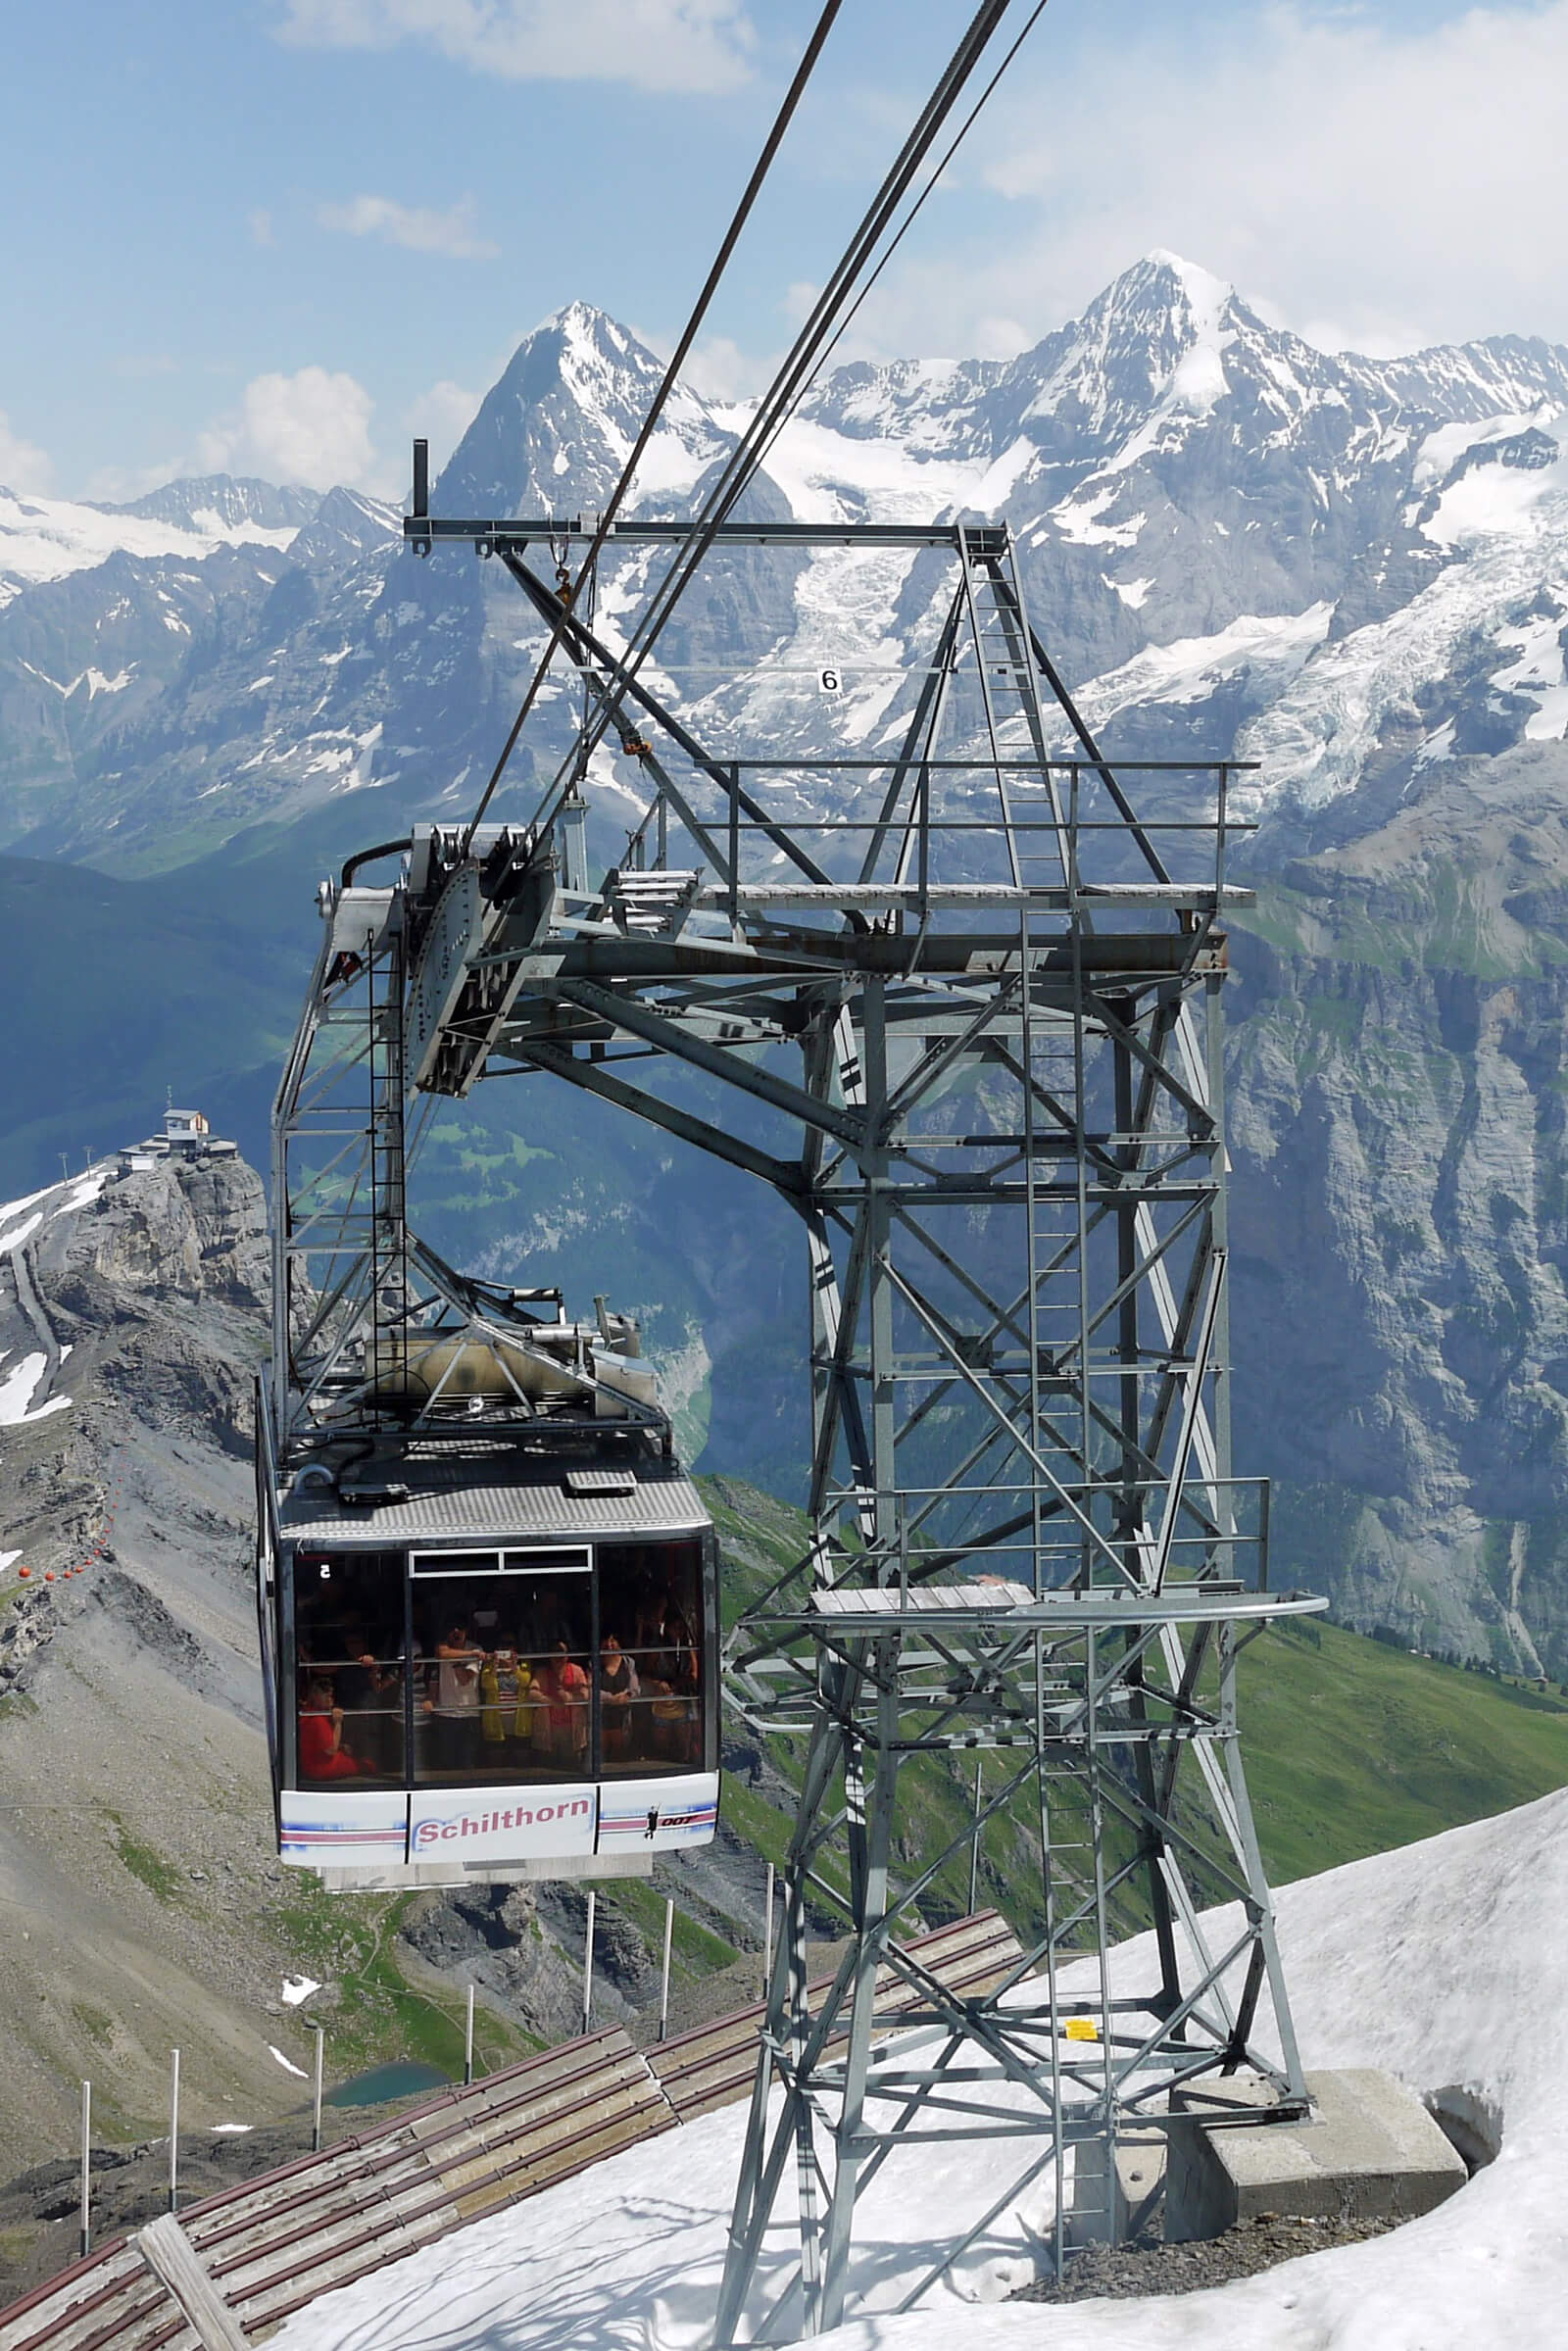 Schilthorn Cable Car